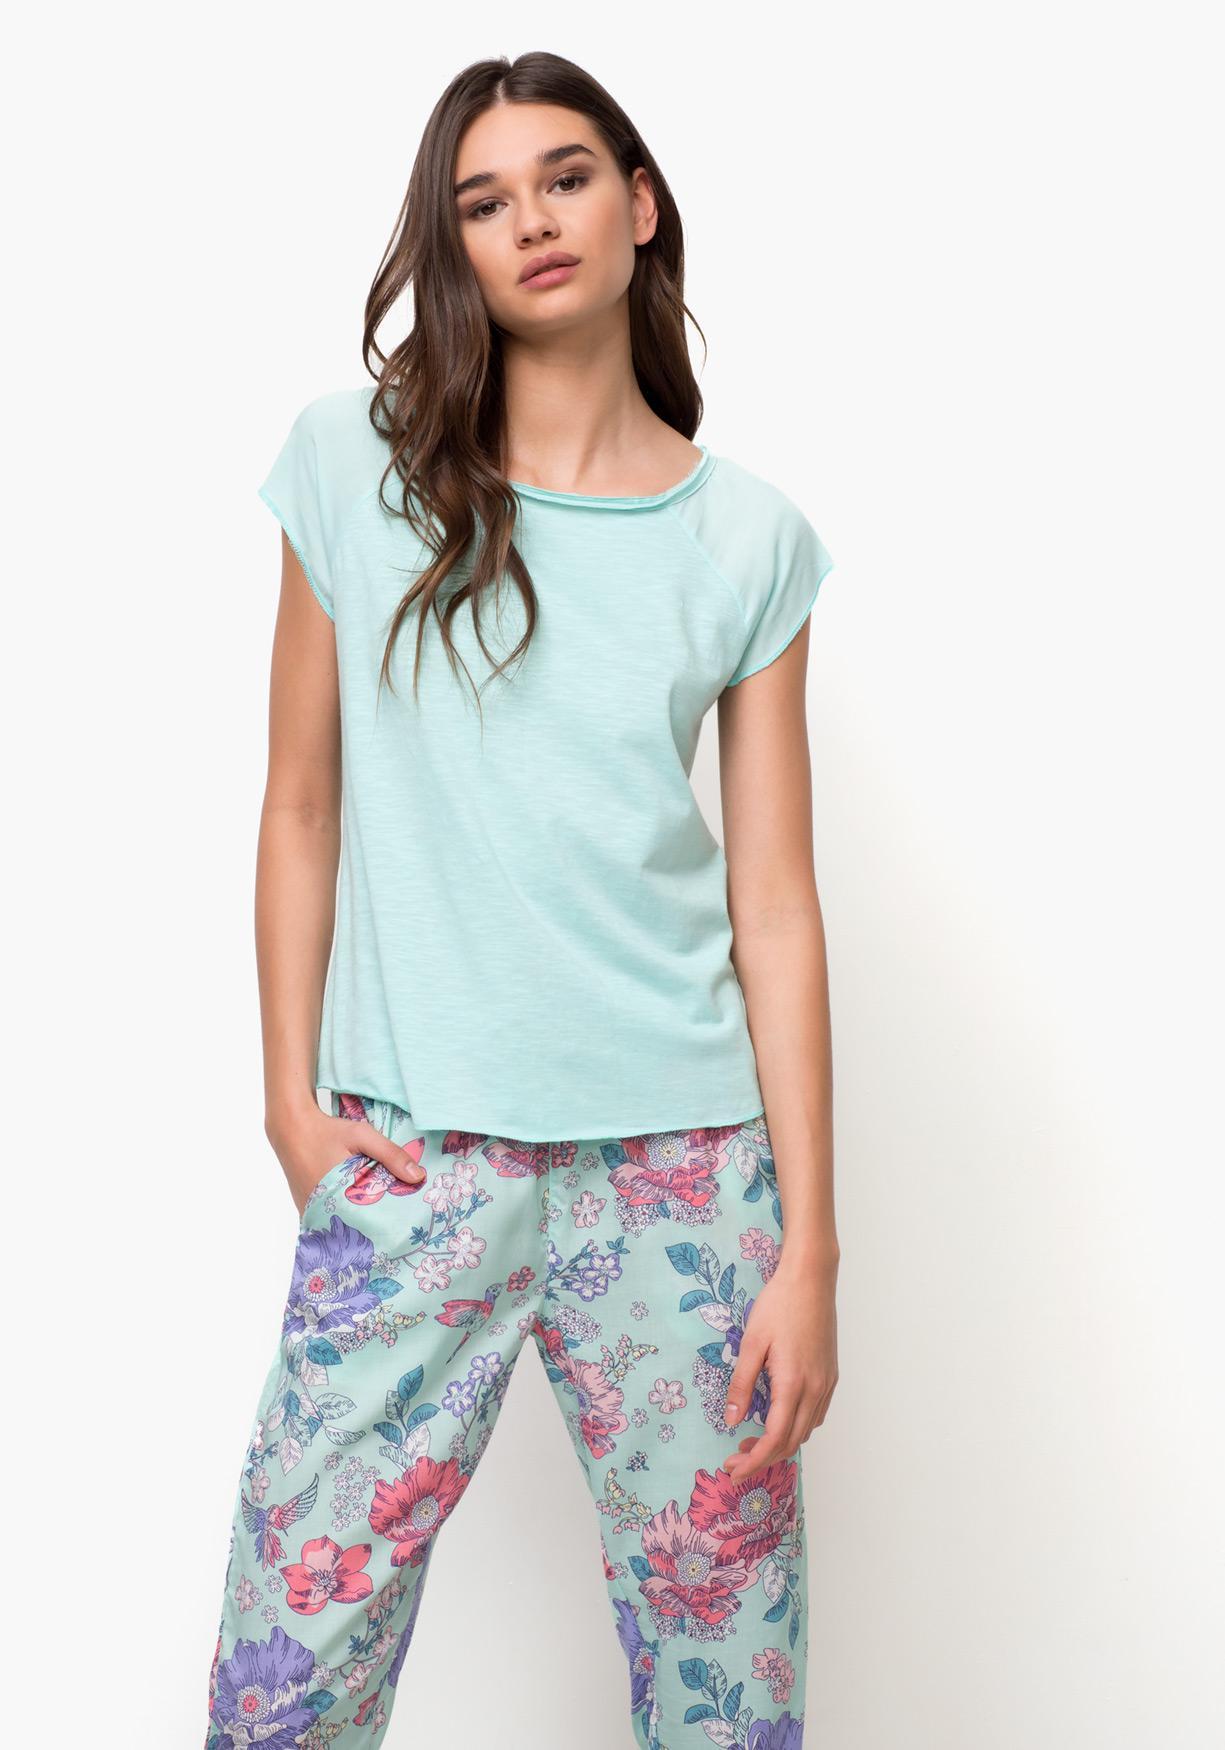 d0bf5936ae Comprar Camiseta lencería de mujer manga corta TEX. ¡Aprovéchate de ...